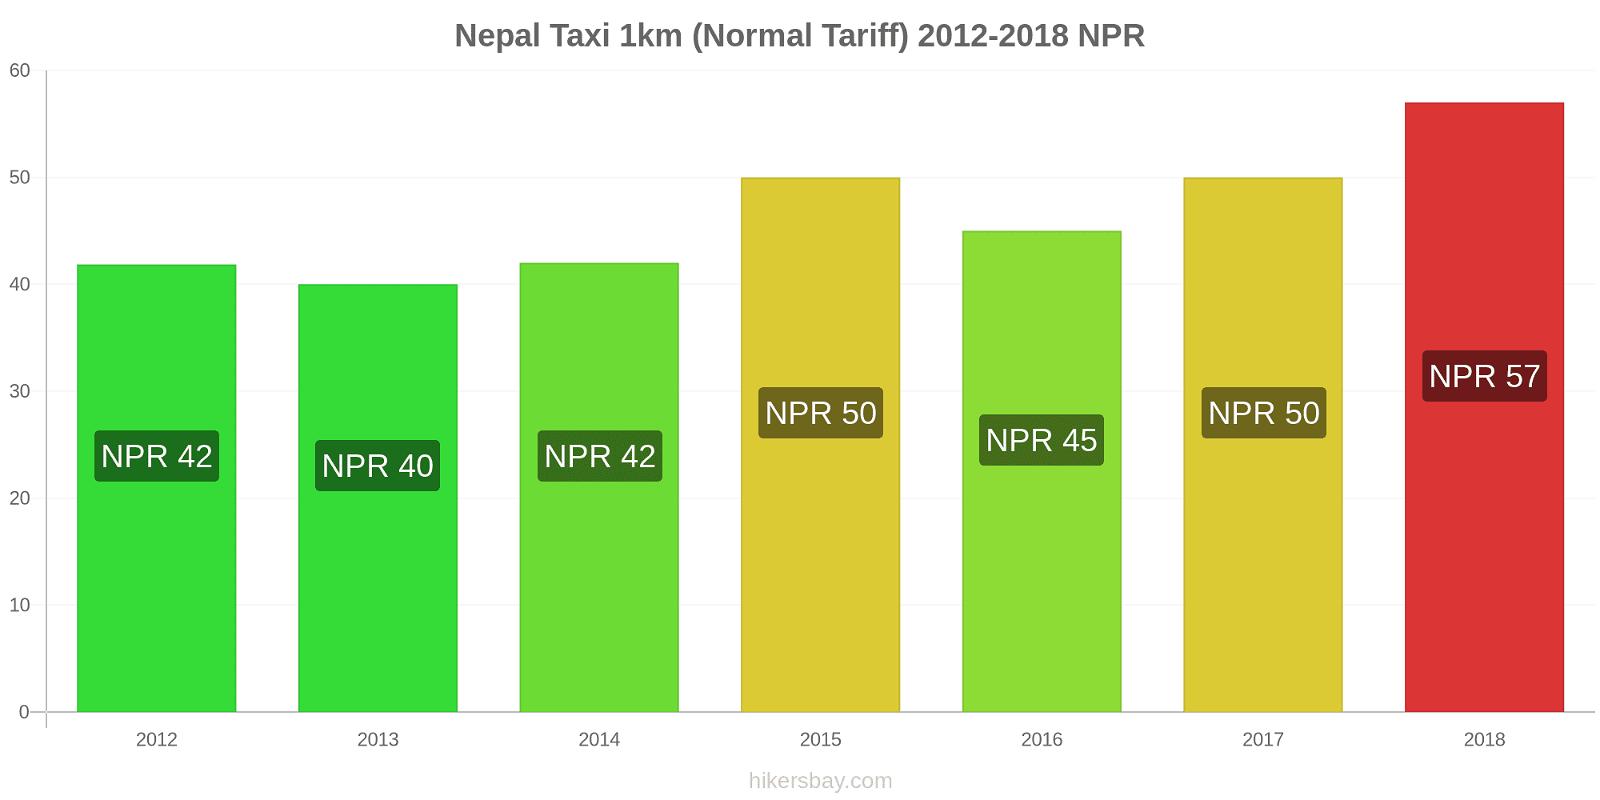 Nepal price changes Taxi 1km (Normal Tariff) hikersbay.com